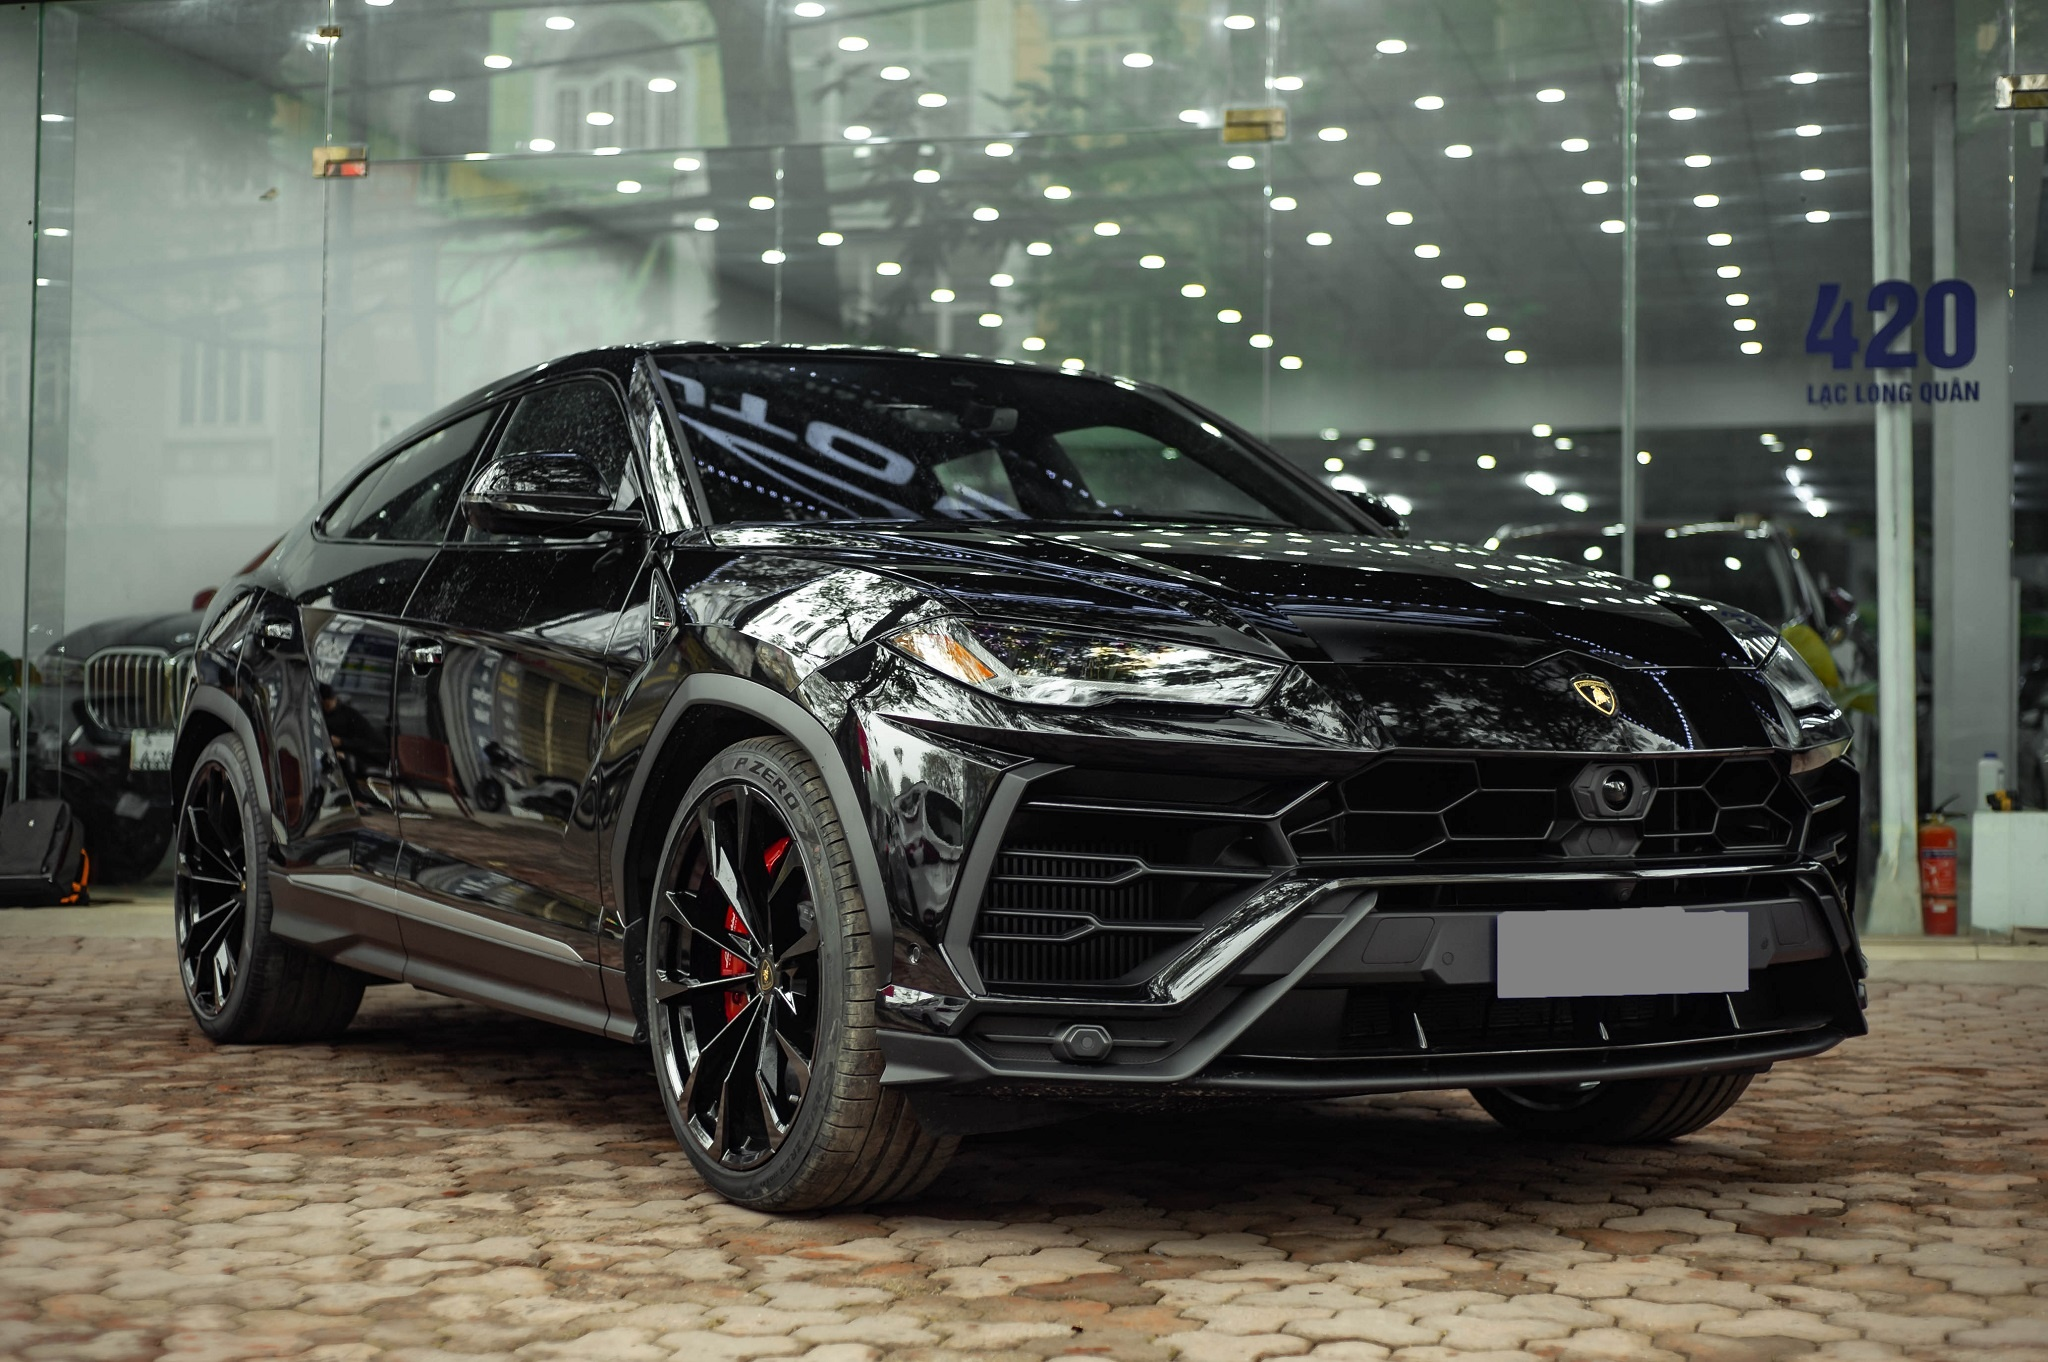 Ngam Lamborghini Urus mau den dau tien ve VN, gia khoang 1 trieu USD hinh anh 3 1_zing_17_.jpg